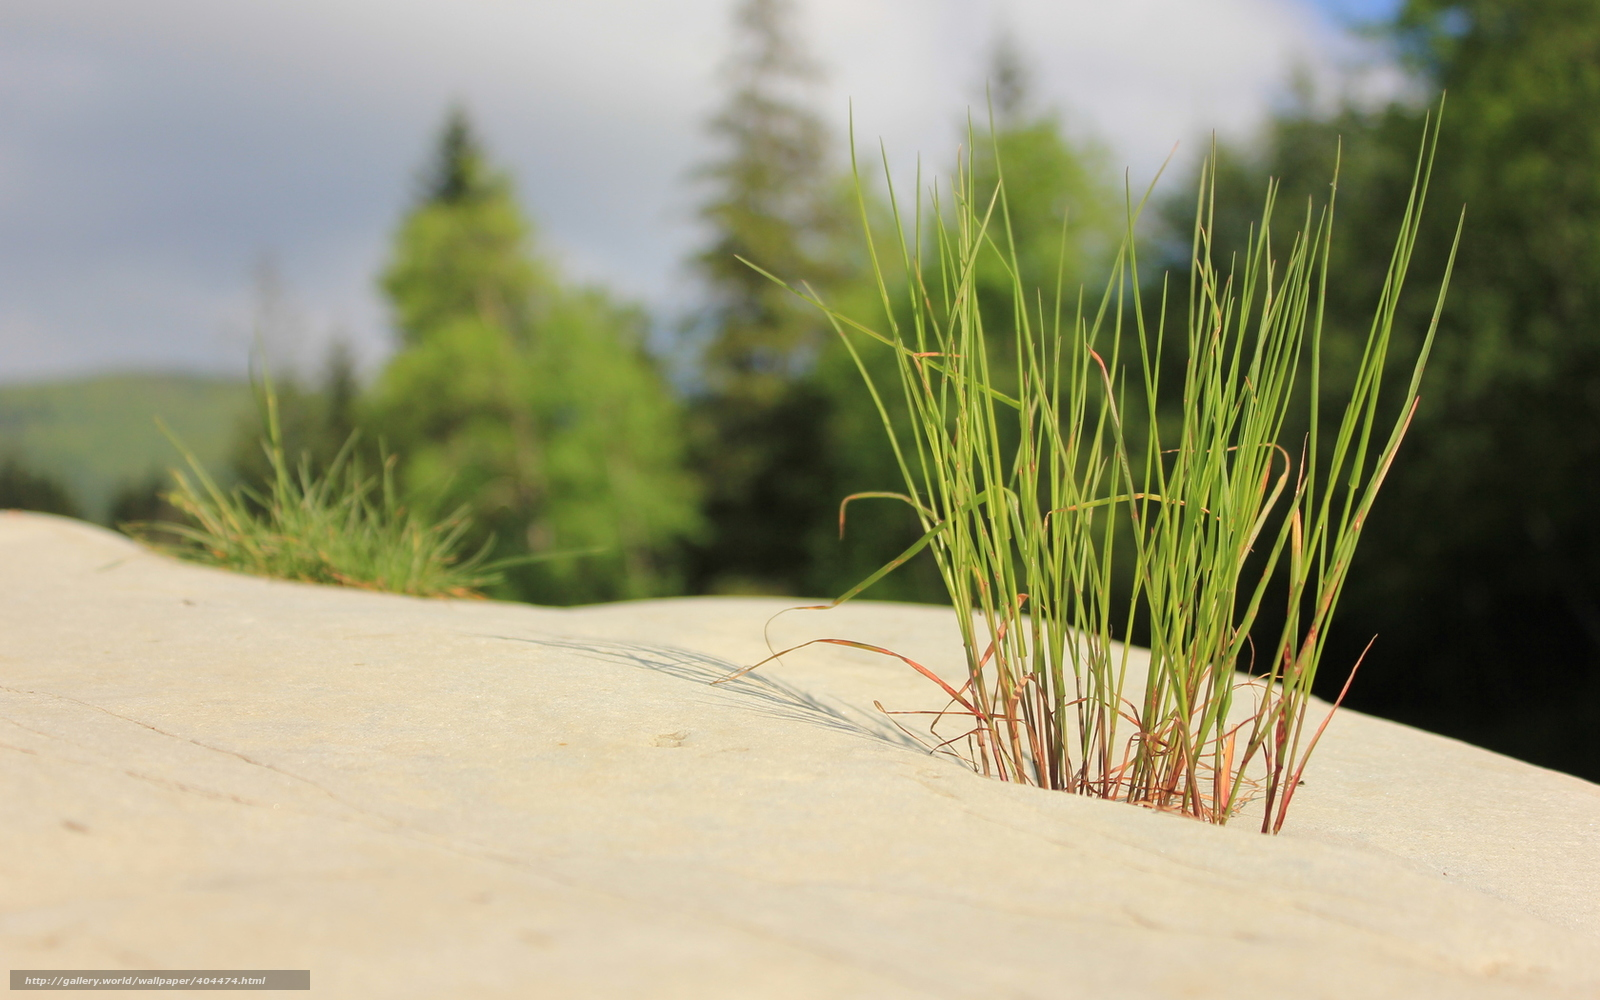 Tlcharger fond d 39 ecran noyaux herbe minimalisme zen for Bureau fond d ecran